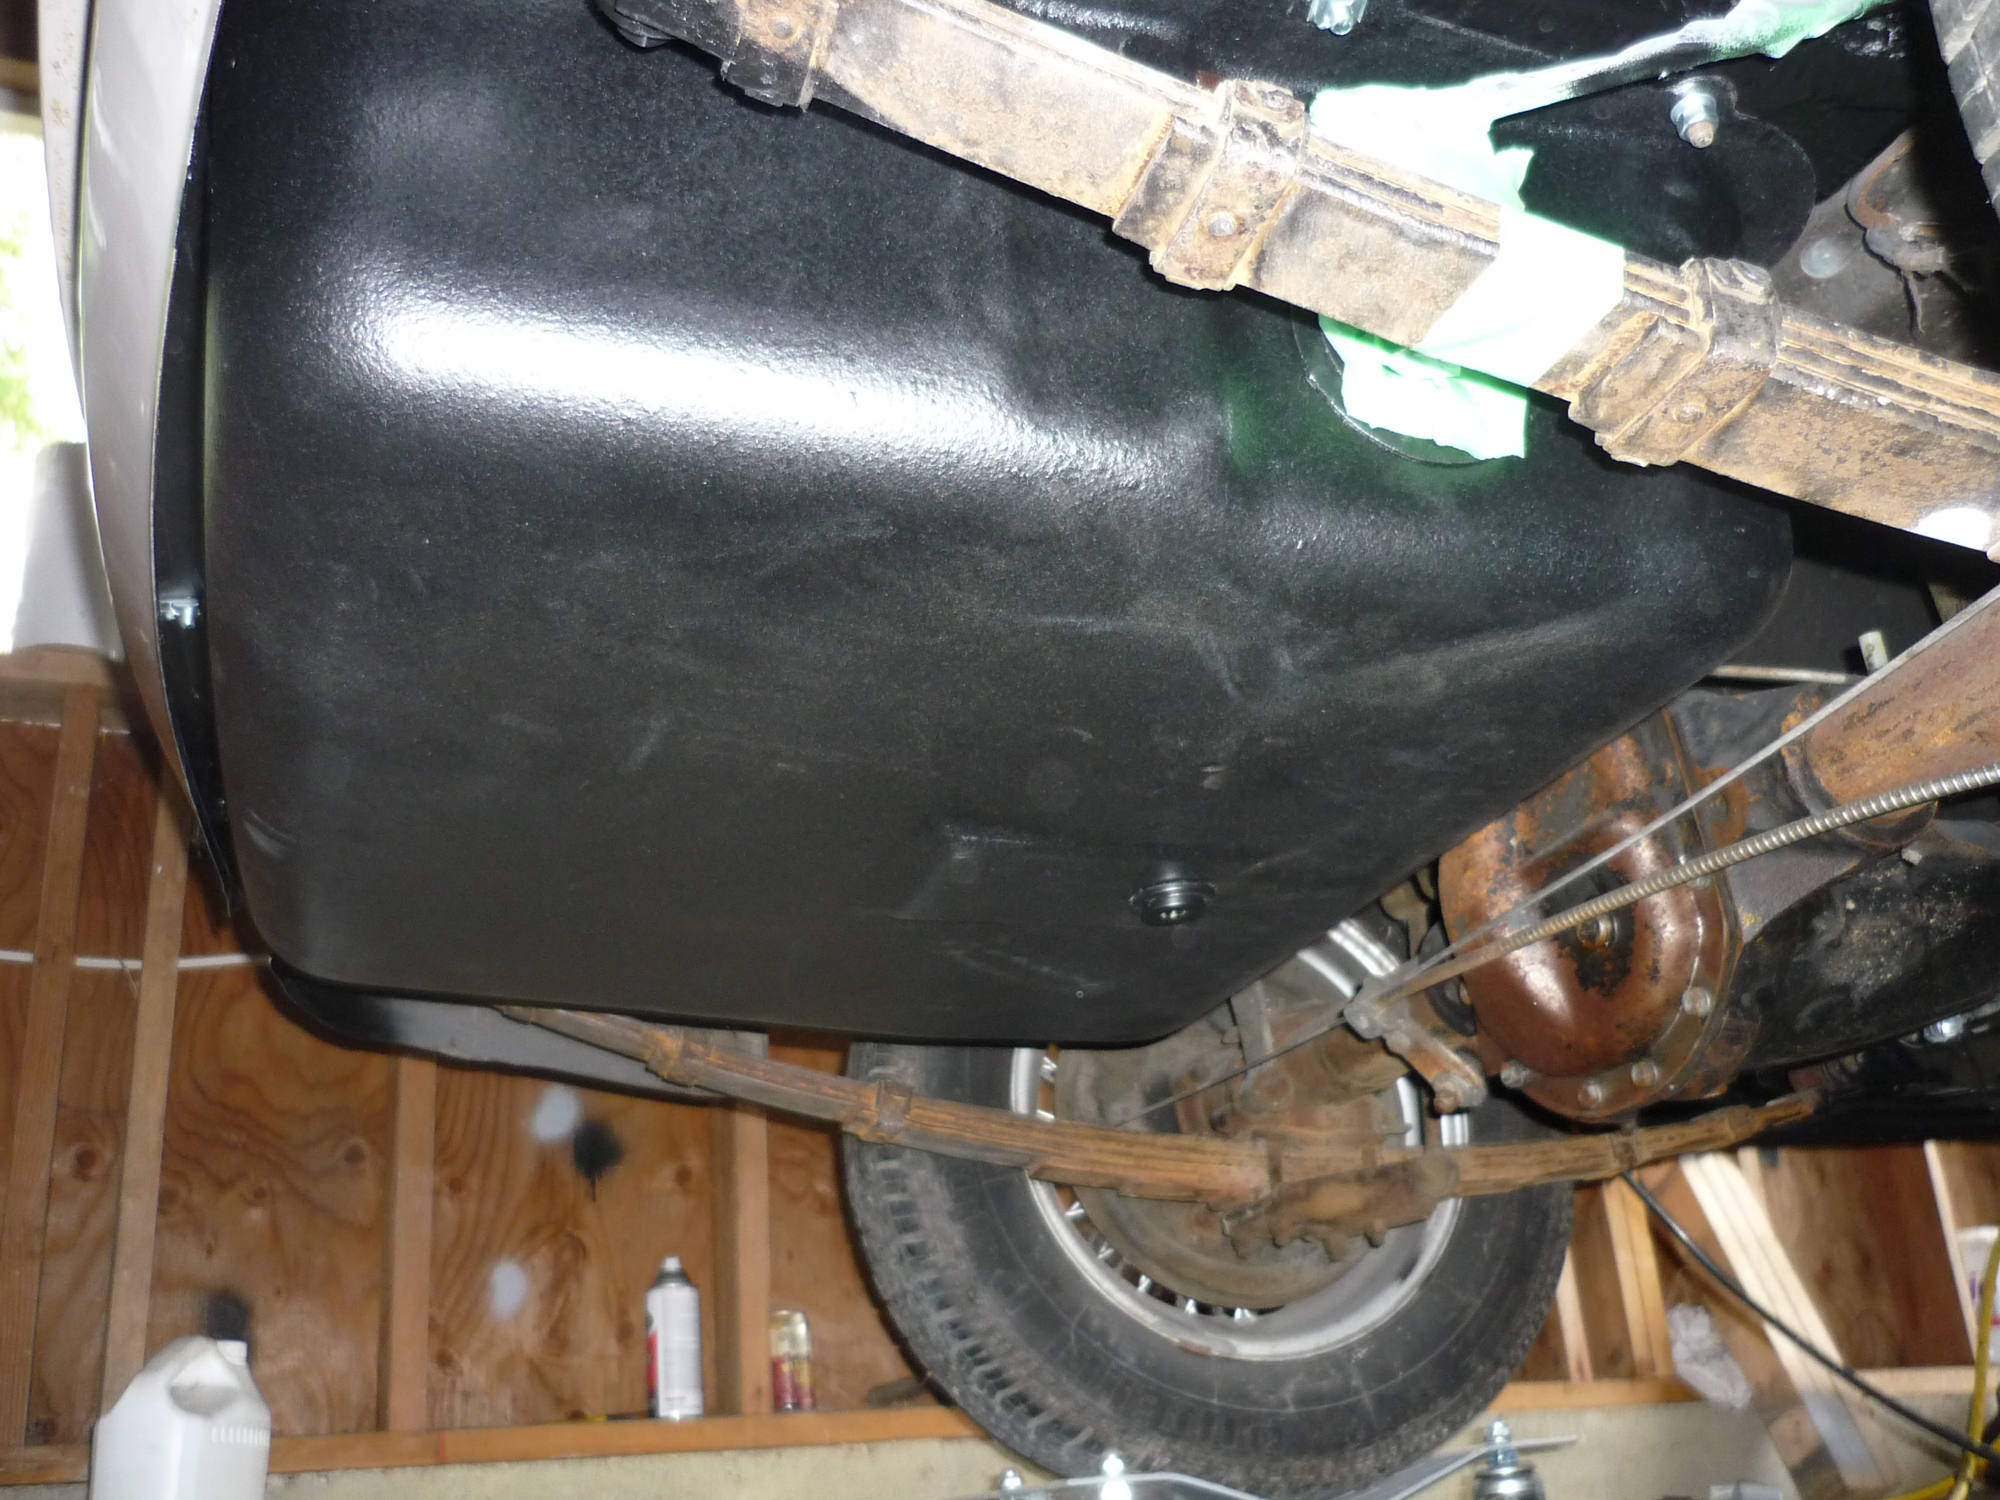 Leaking MGB GT gas tank